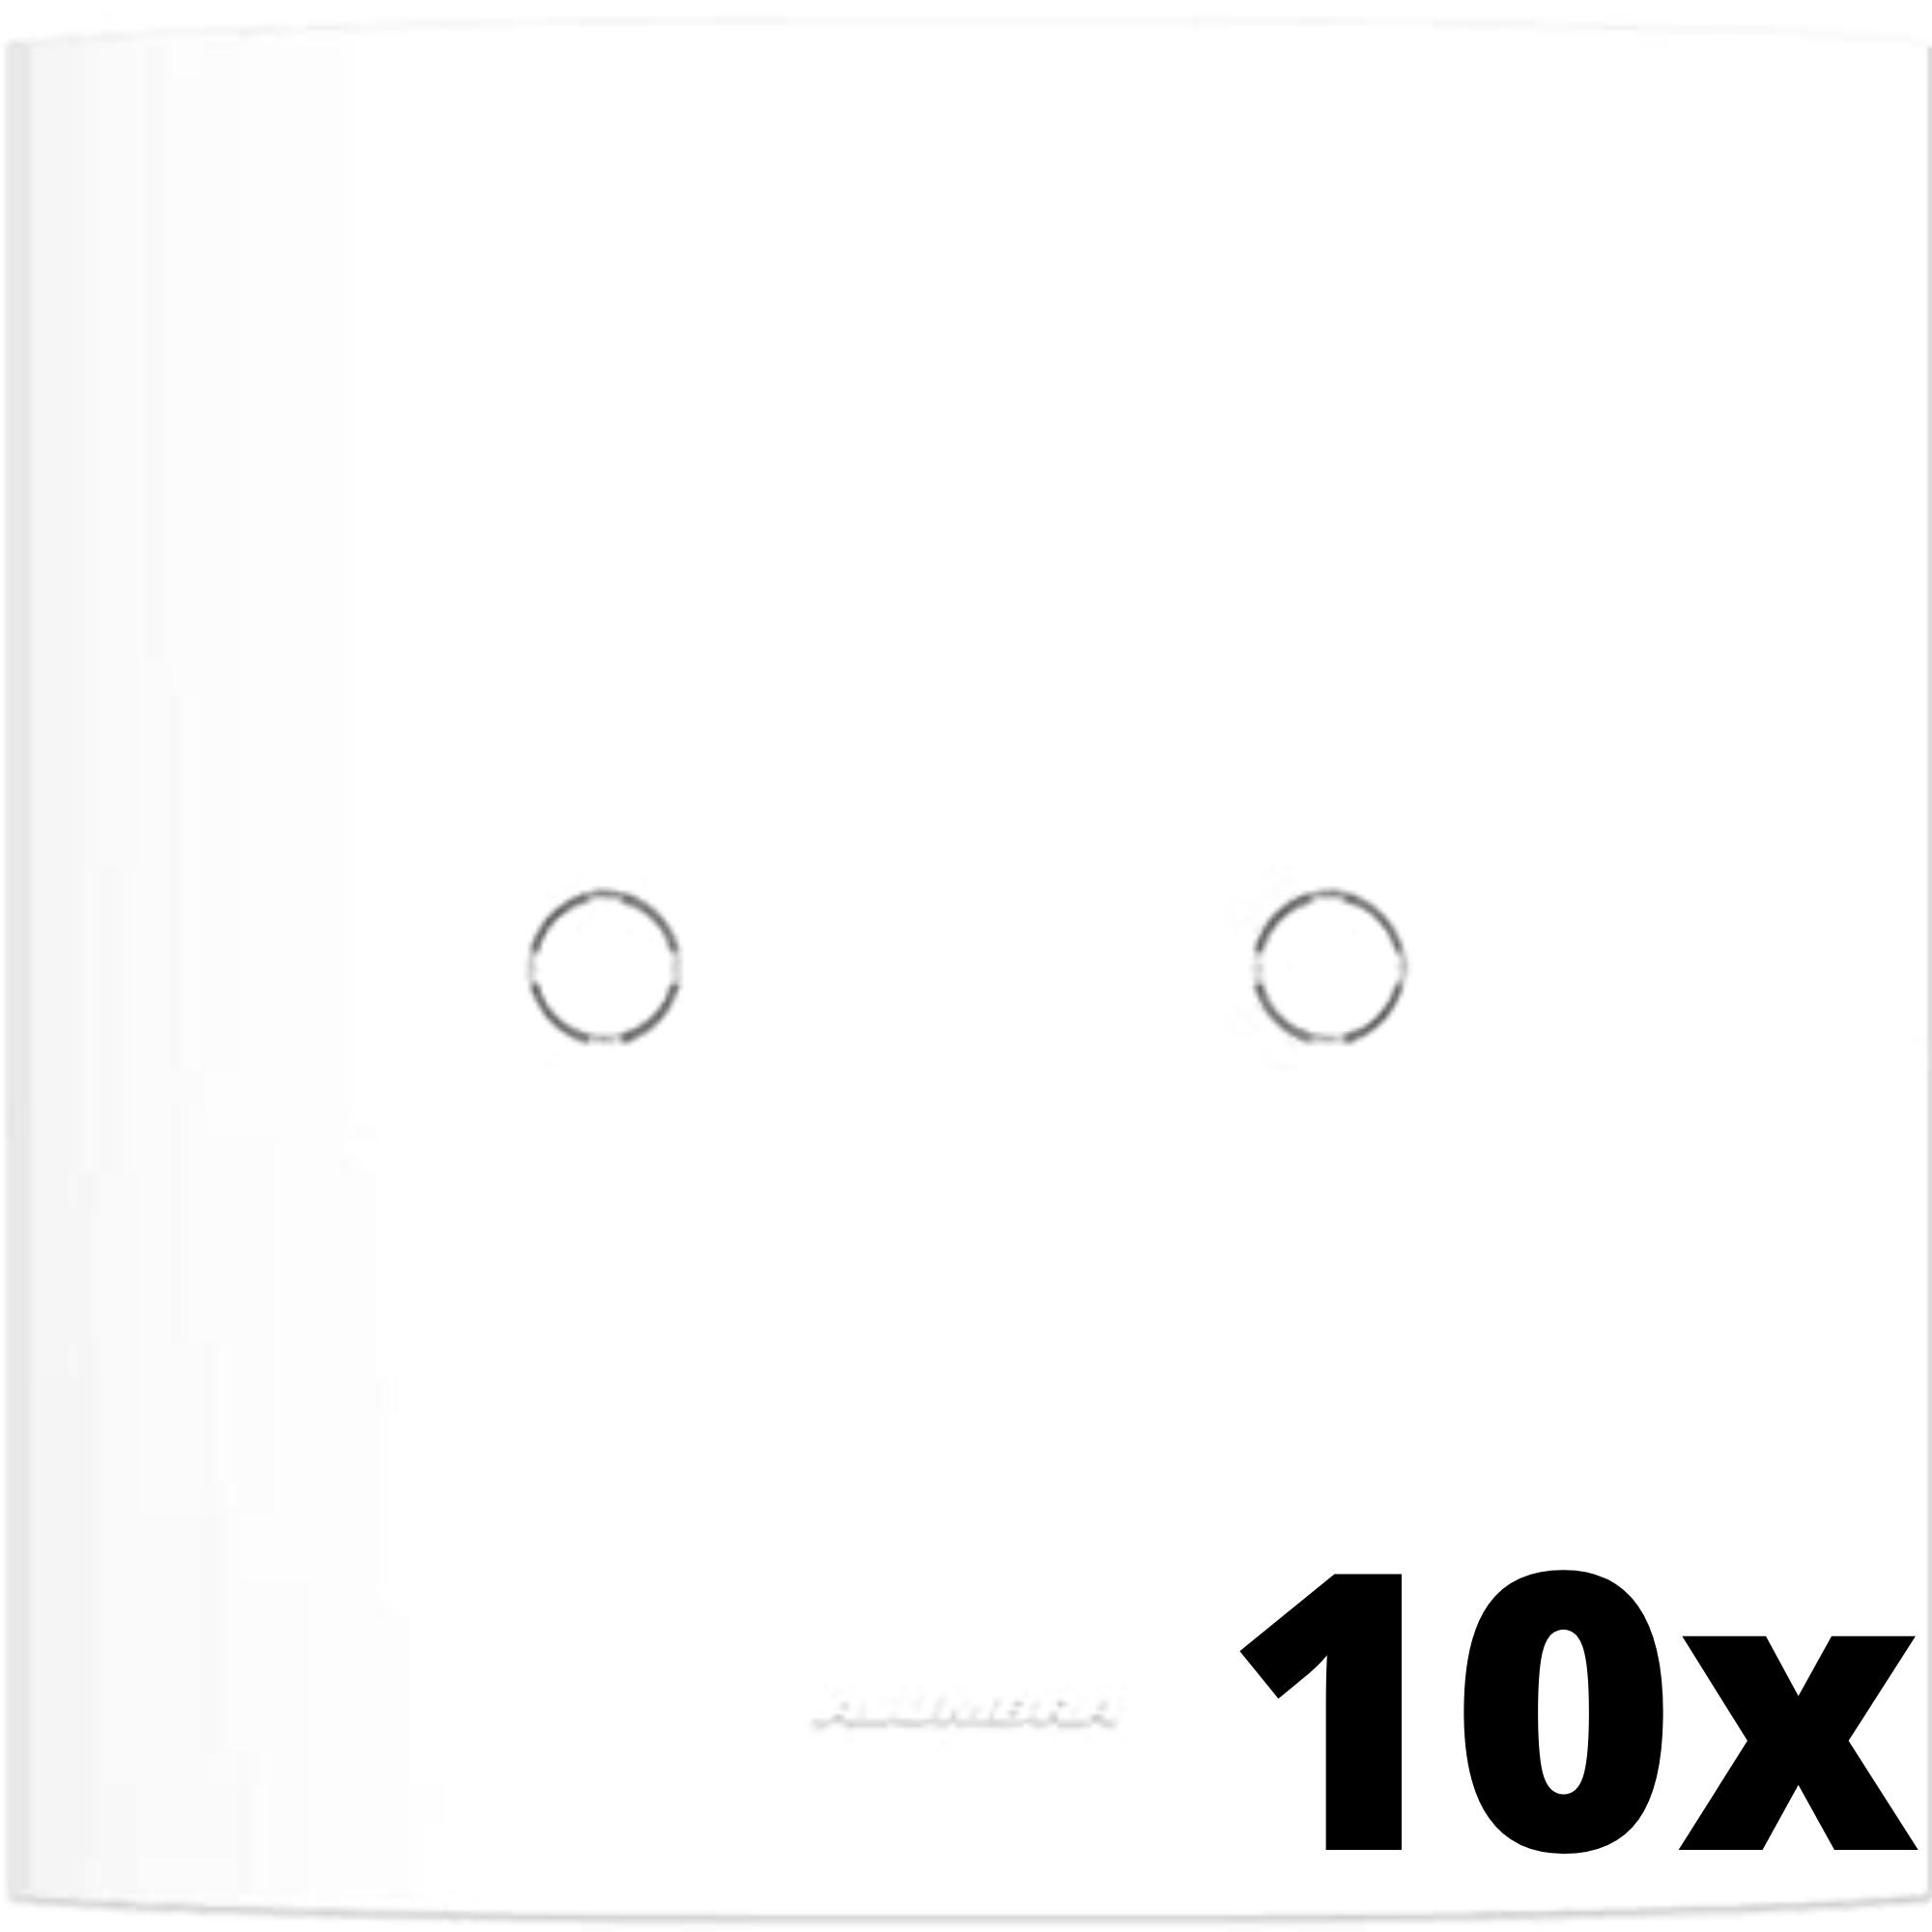 Kit 10 und Inova Pró Placa 4x4 Cega